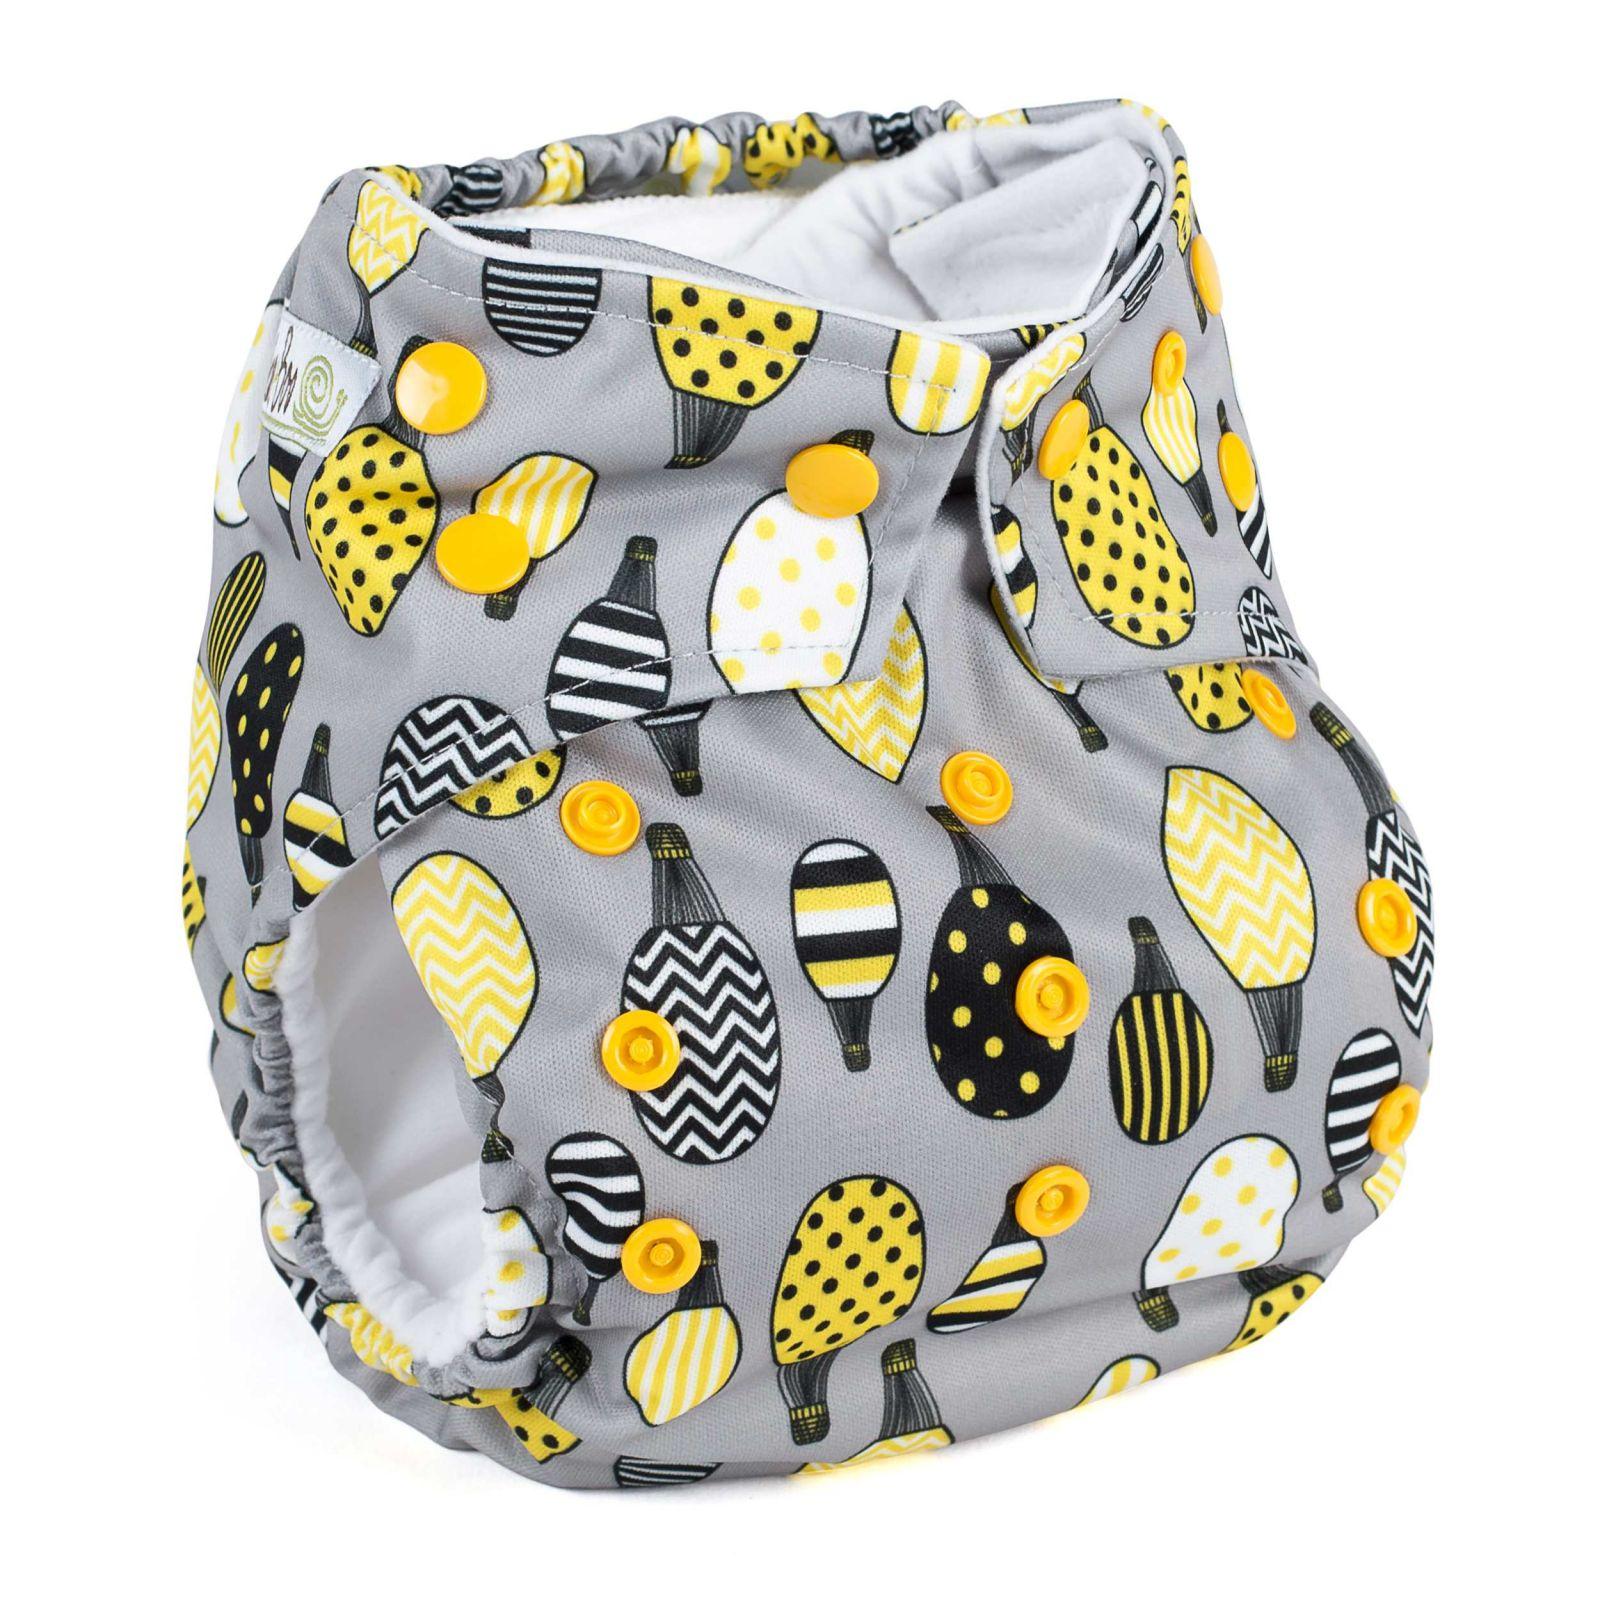 Baba+Boo plenkové kalhotky V2, Design Air Ballons